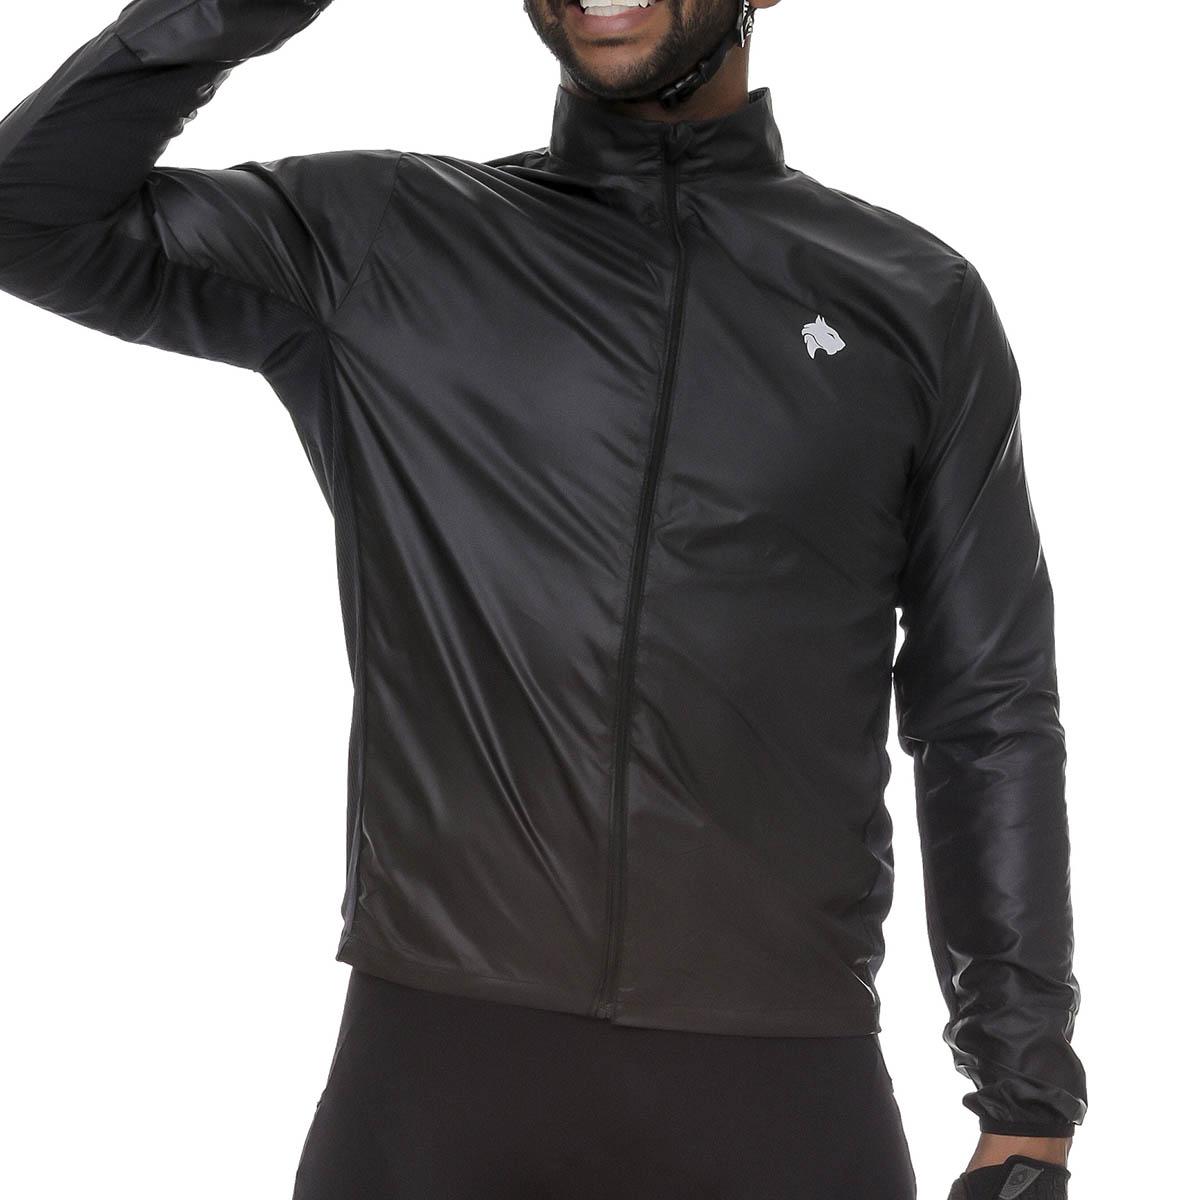 Jaqueta Corta Vento Lynce Masculina Black Titanium com Ziper Refletivo Preto Ciclismo